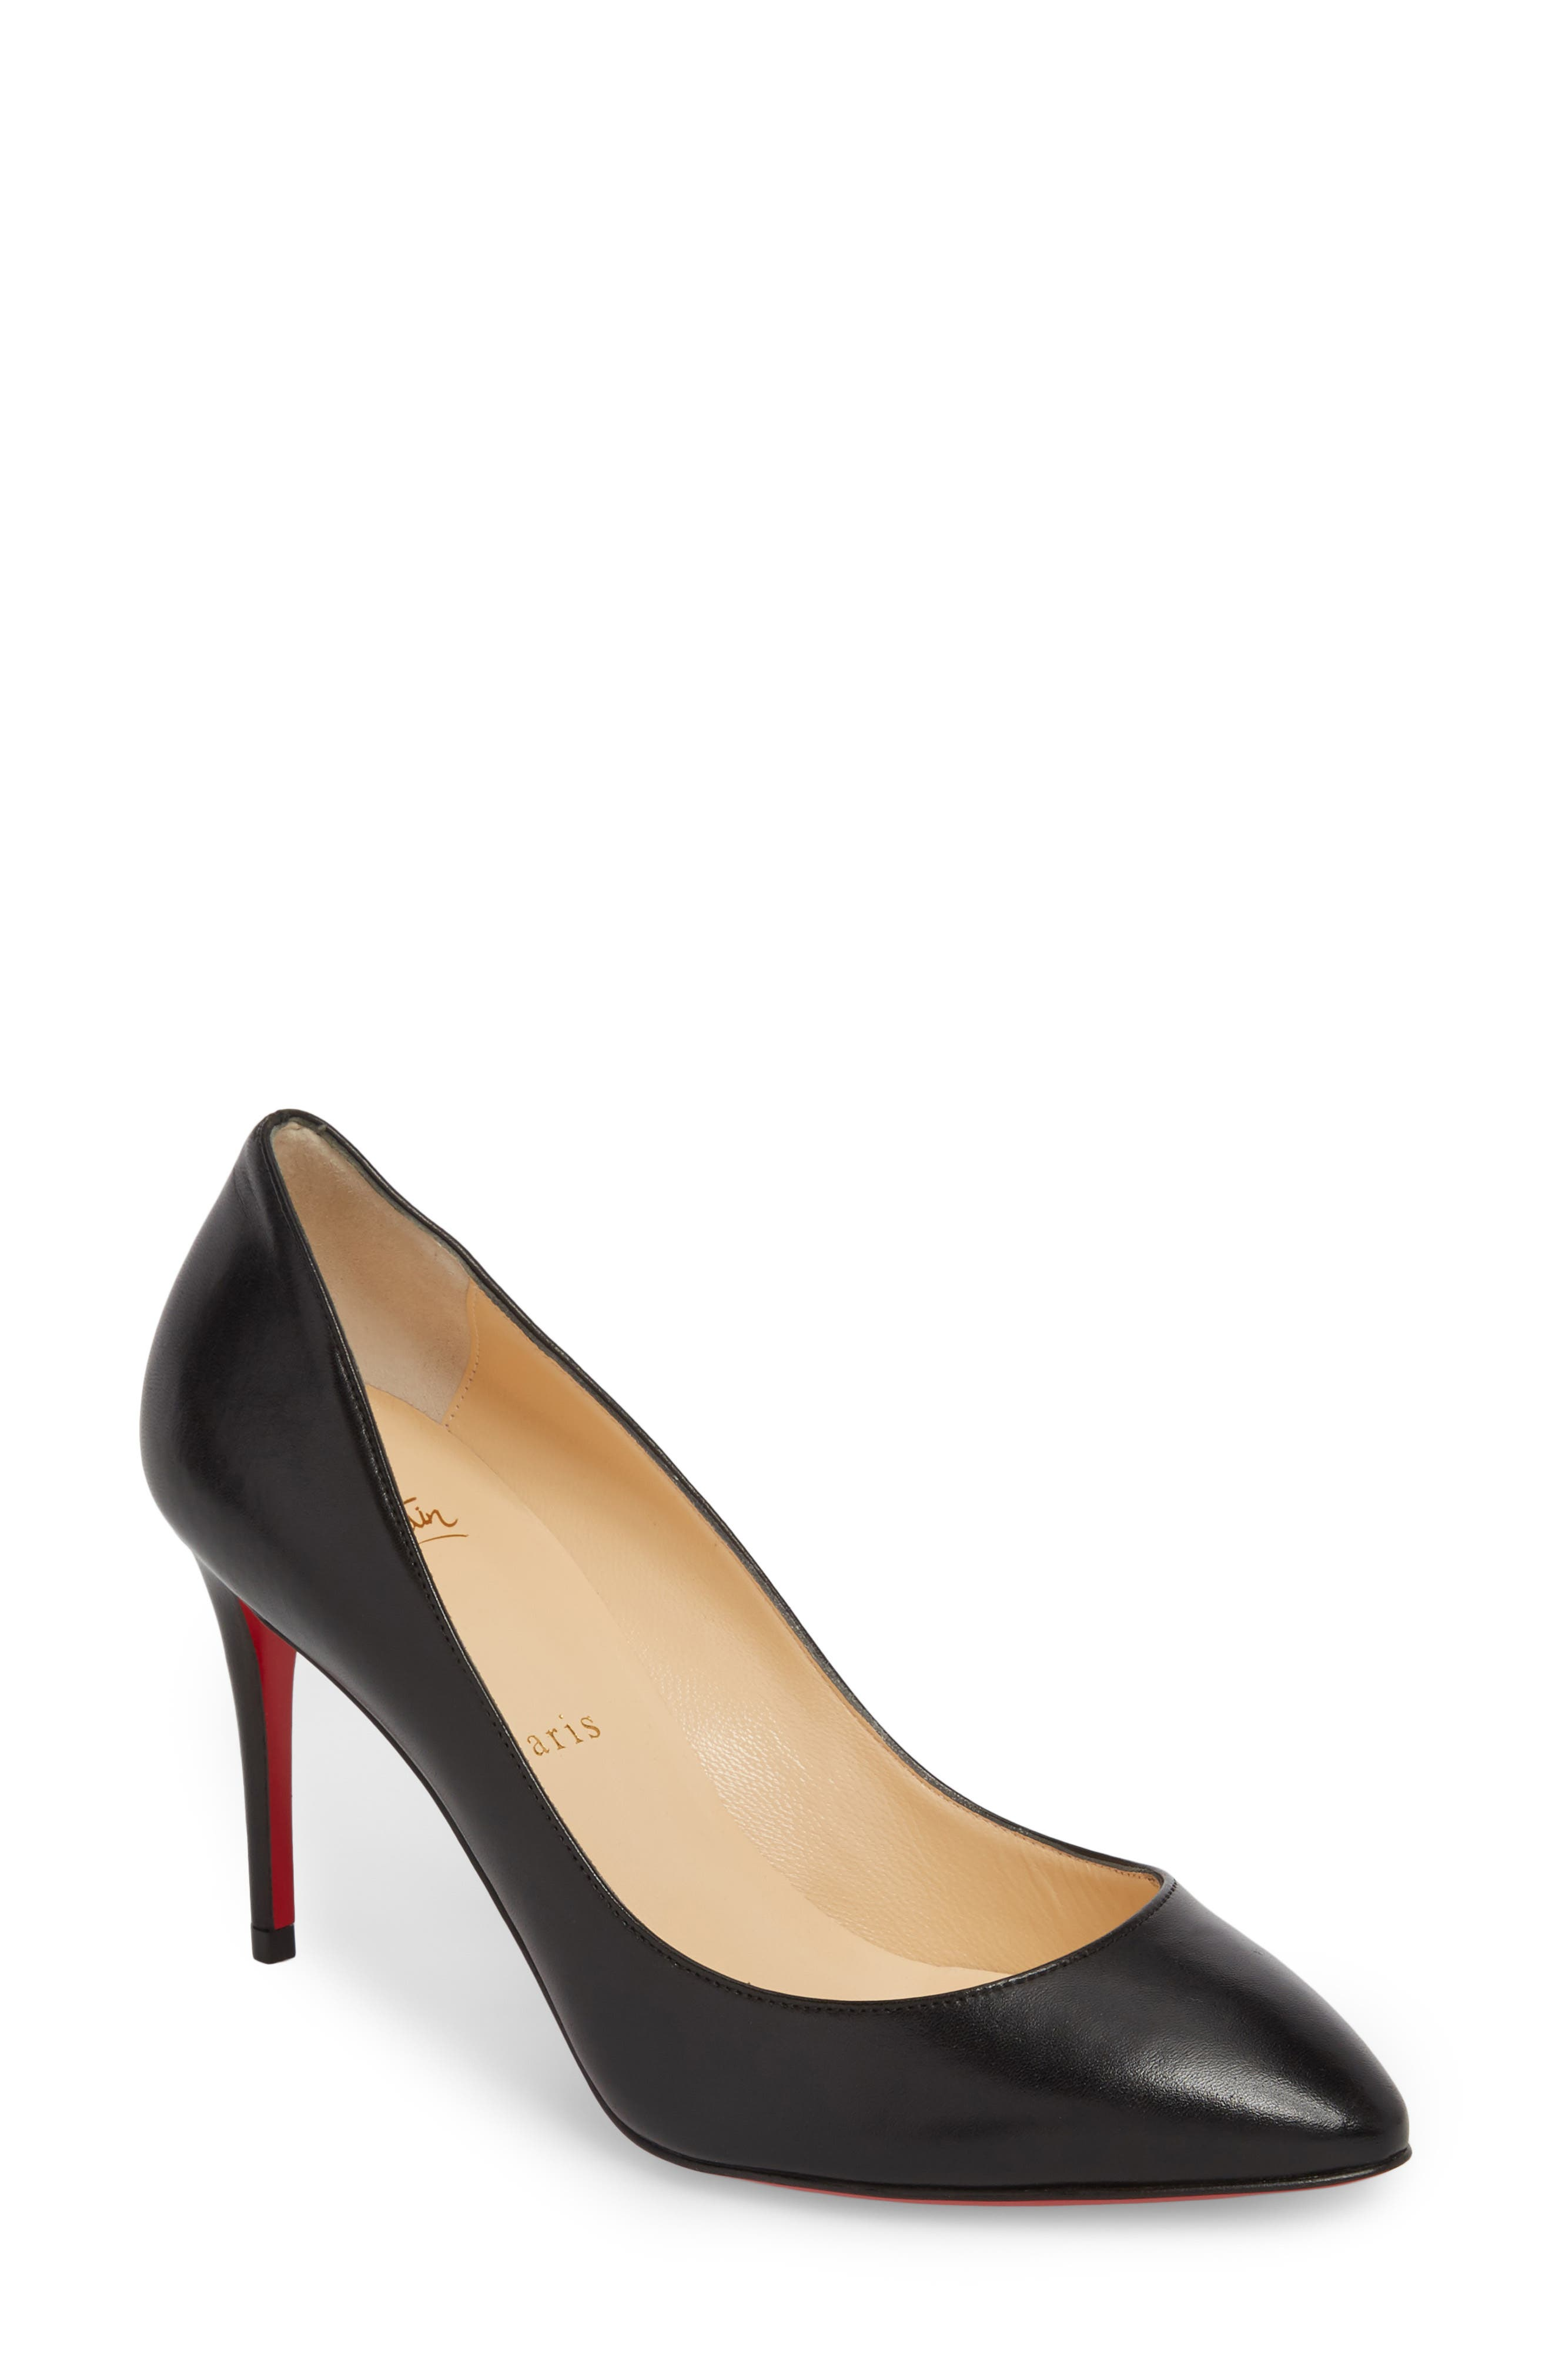 CHRISTIAN LOUBOUTIN Eloise Pointy Toe Pump, Main, color, BLACK